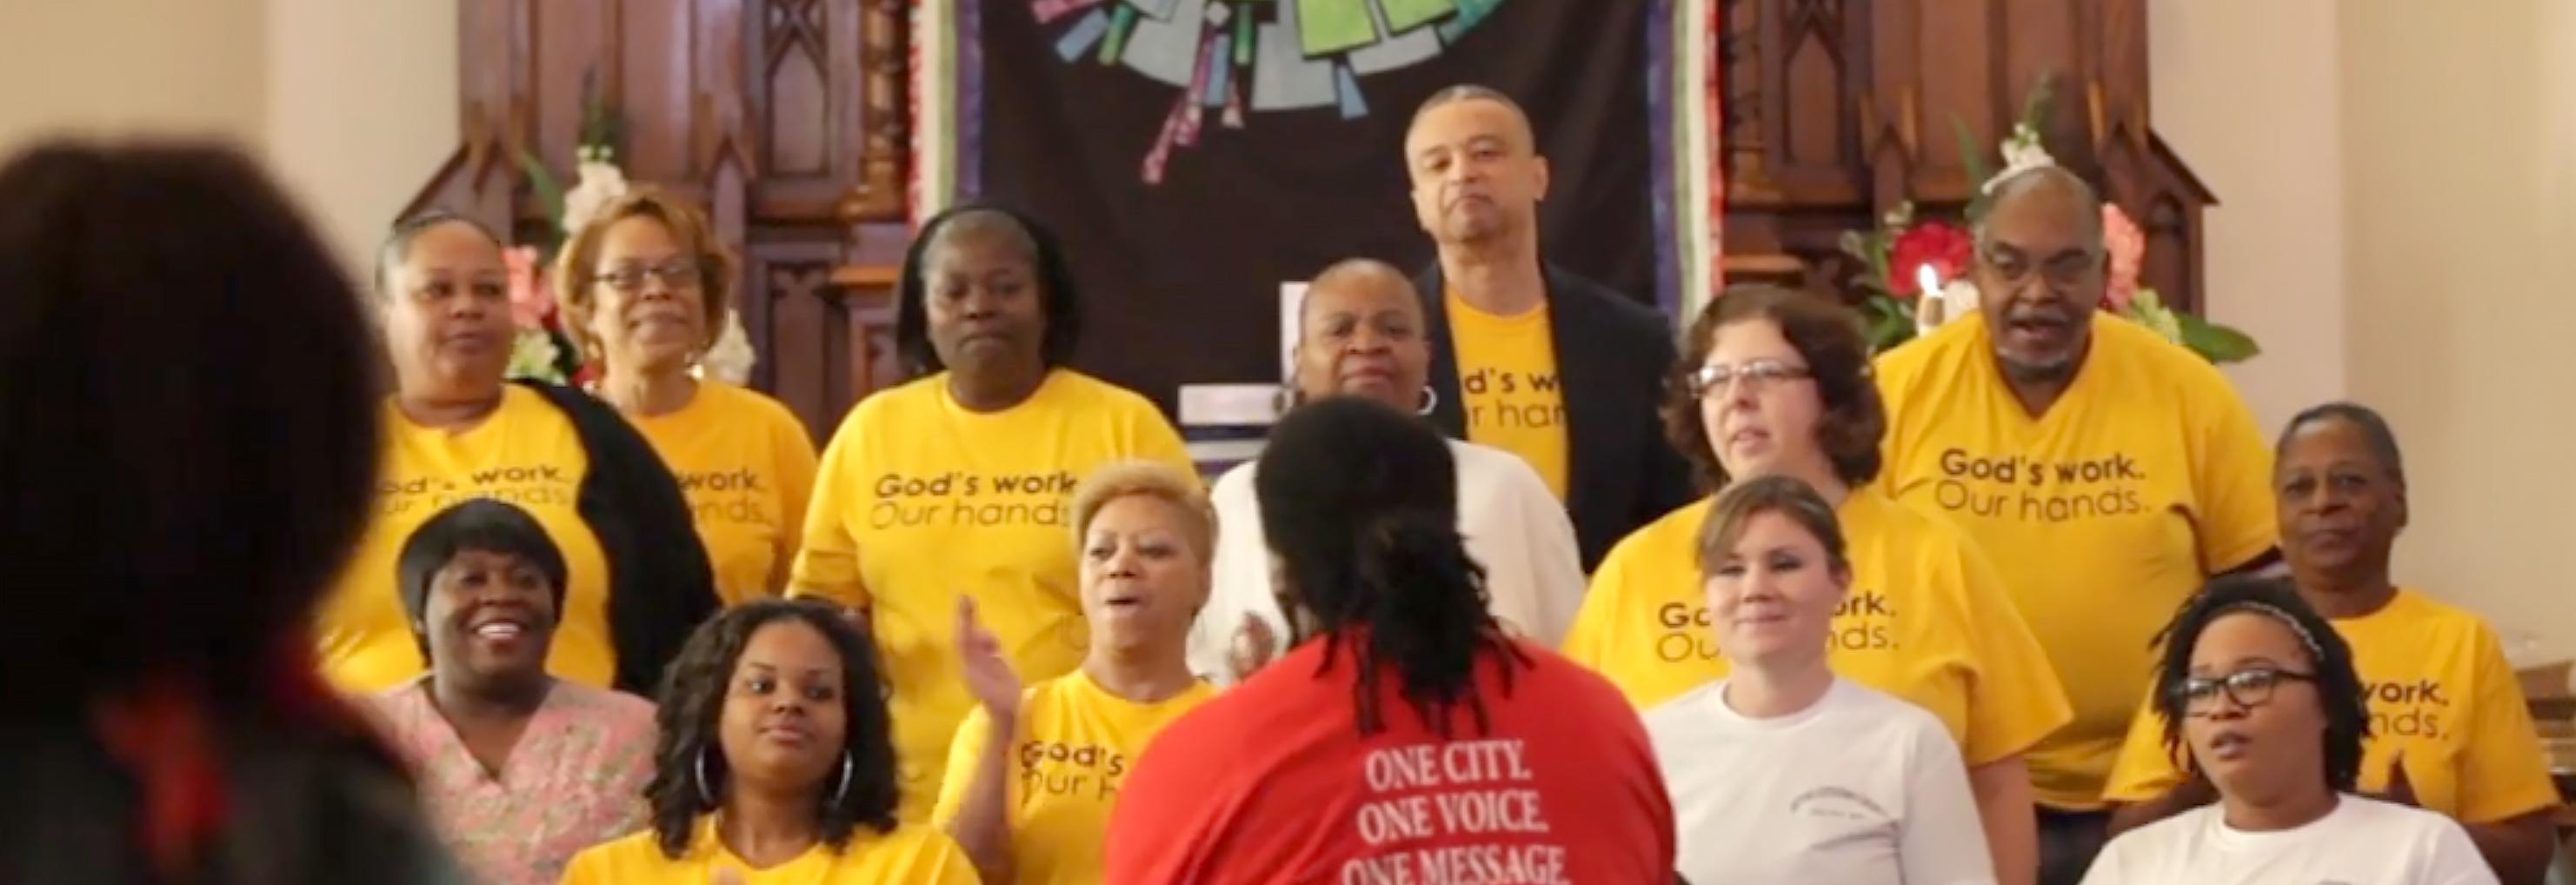 God's work. Our hands. Sunday Hymn Contest